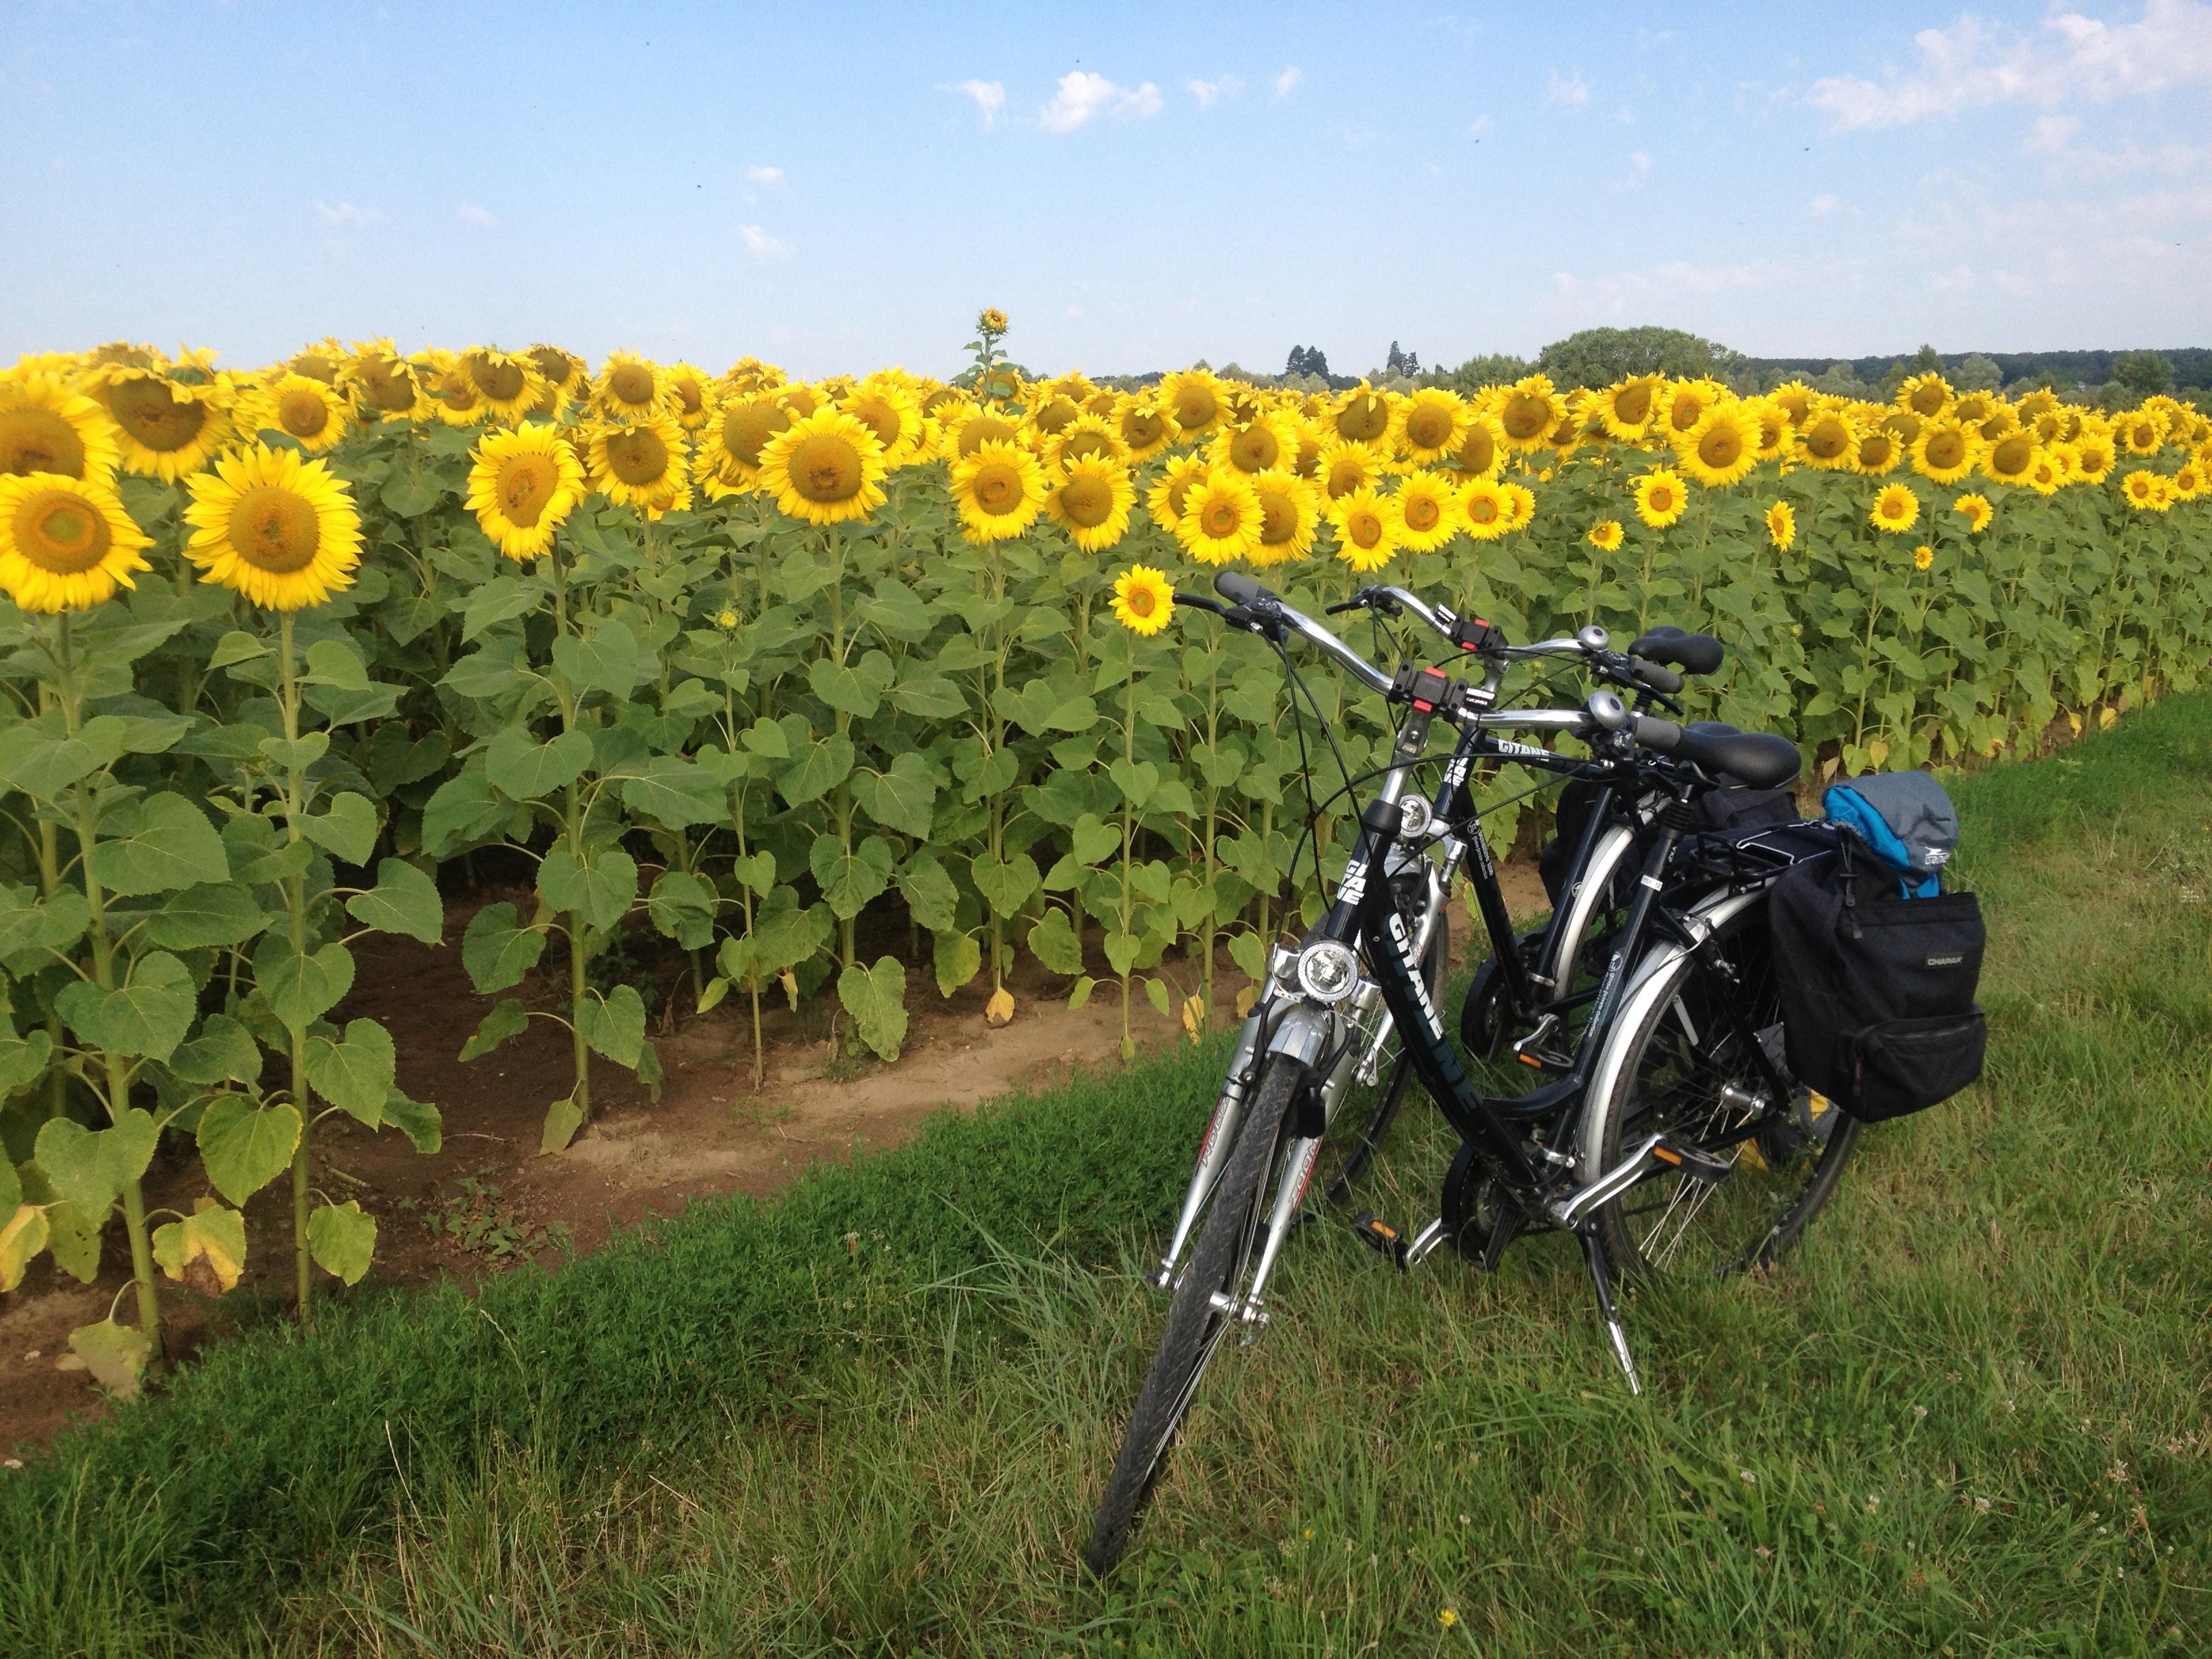 Loire_Valley_sunflowers-original (1)